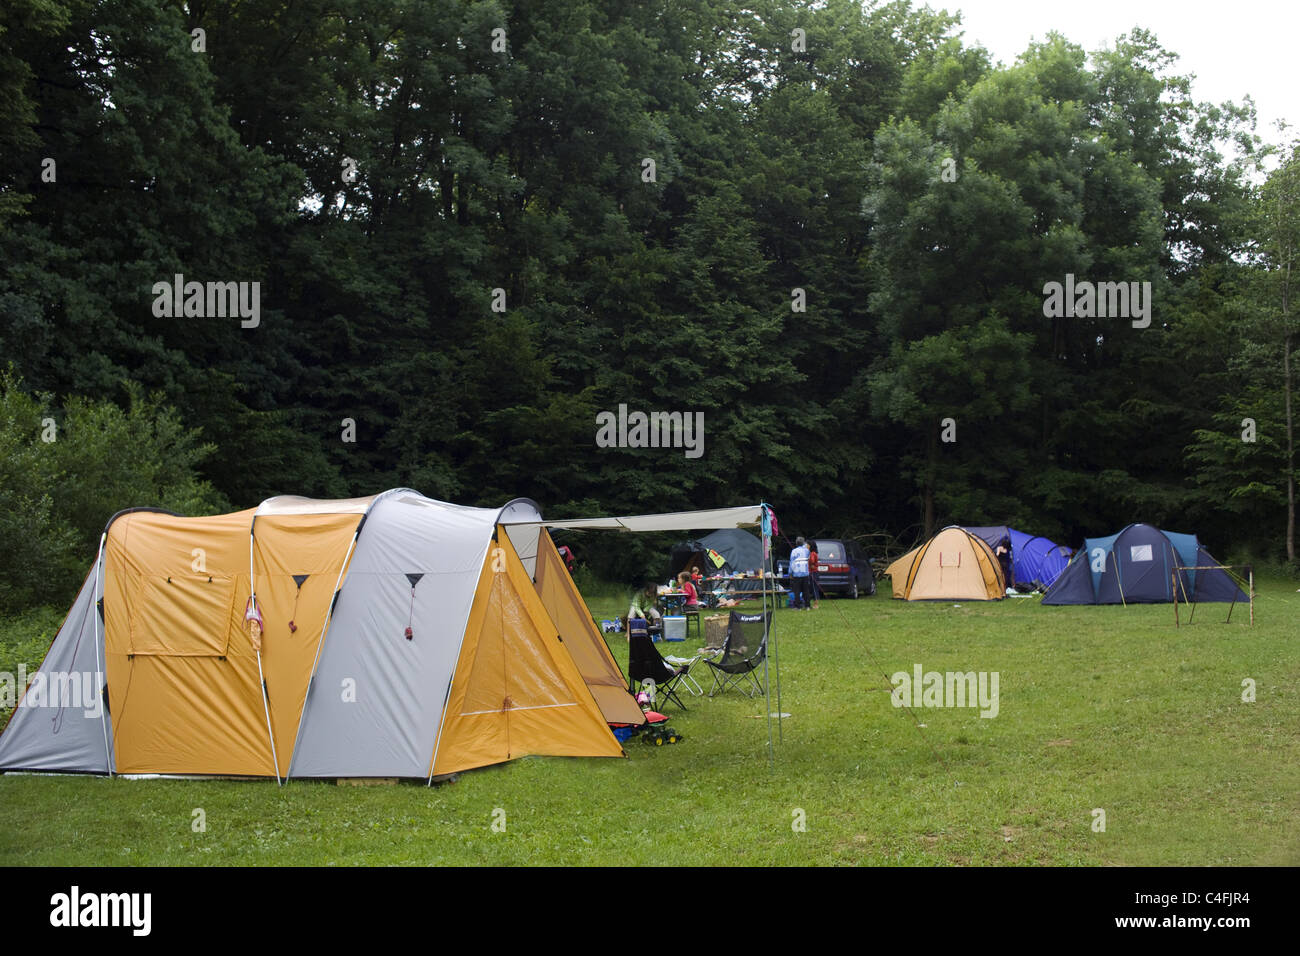 Camping - Stock Image